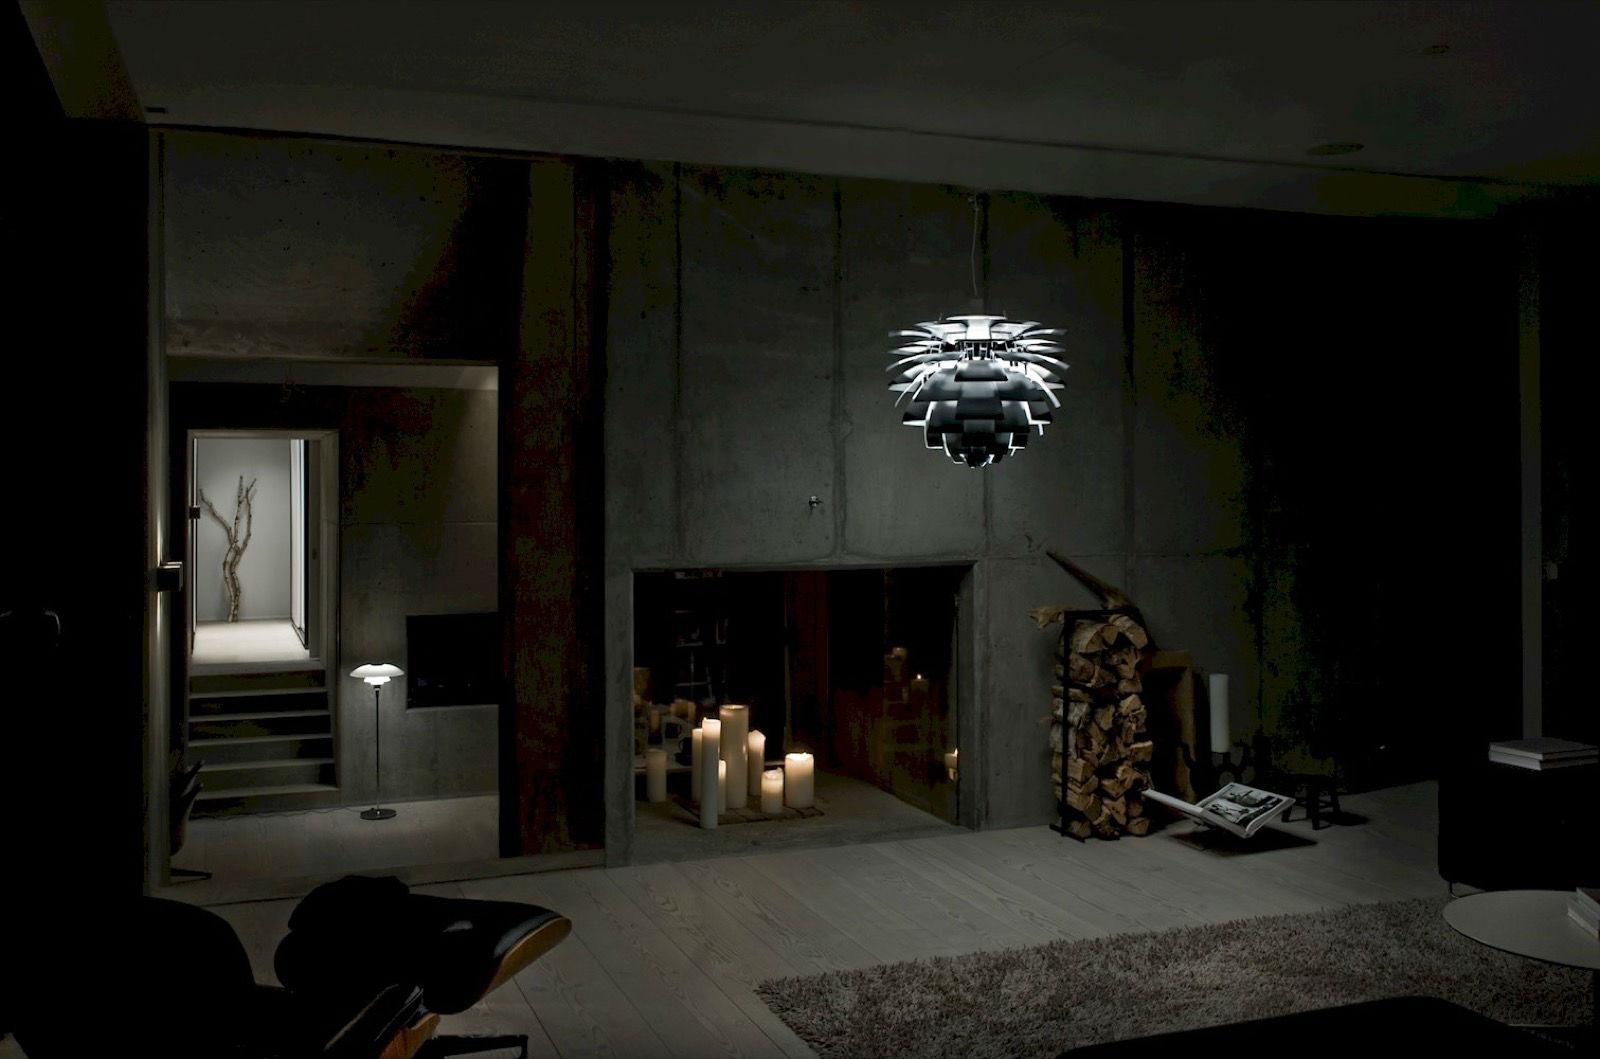 louis poulsen ph artichoke hanglamp matser wageningen. Black Bedroom Furniture Sets. Home Design Ideas